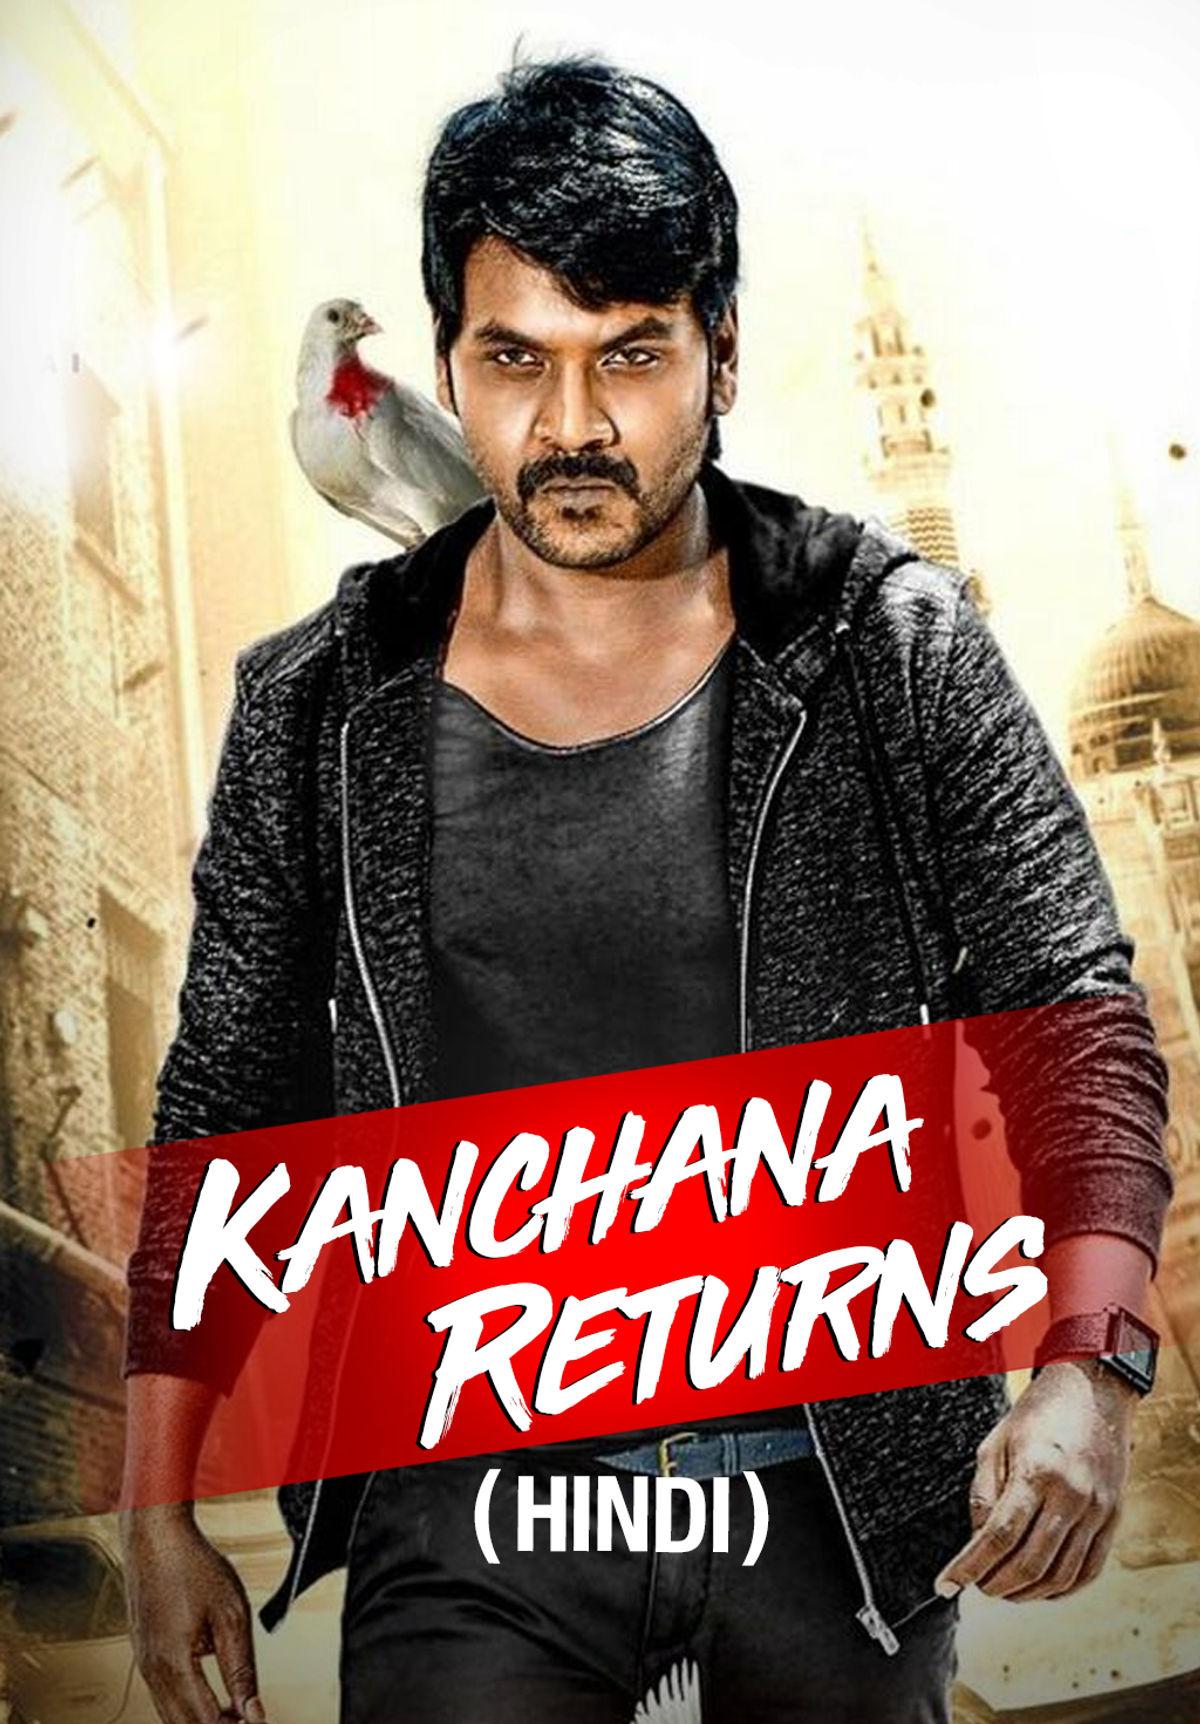 Kanchana Returns